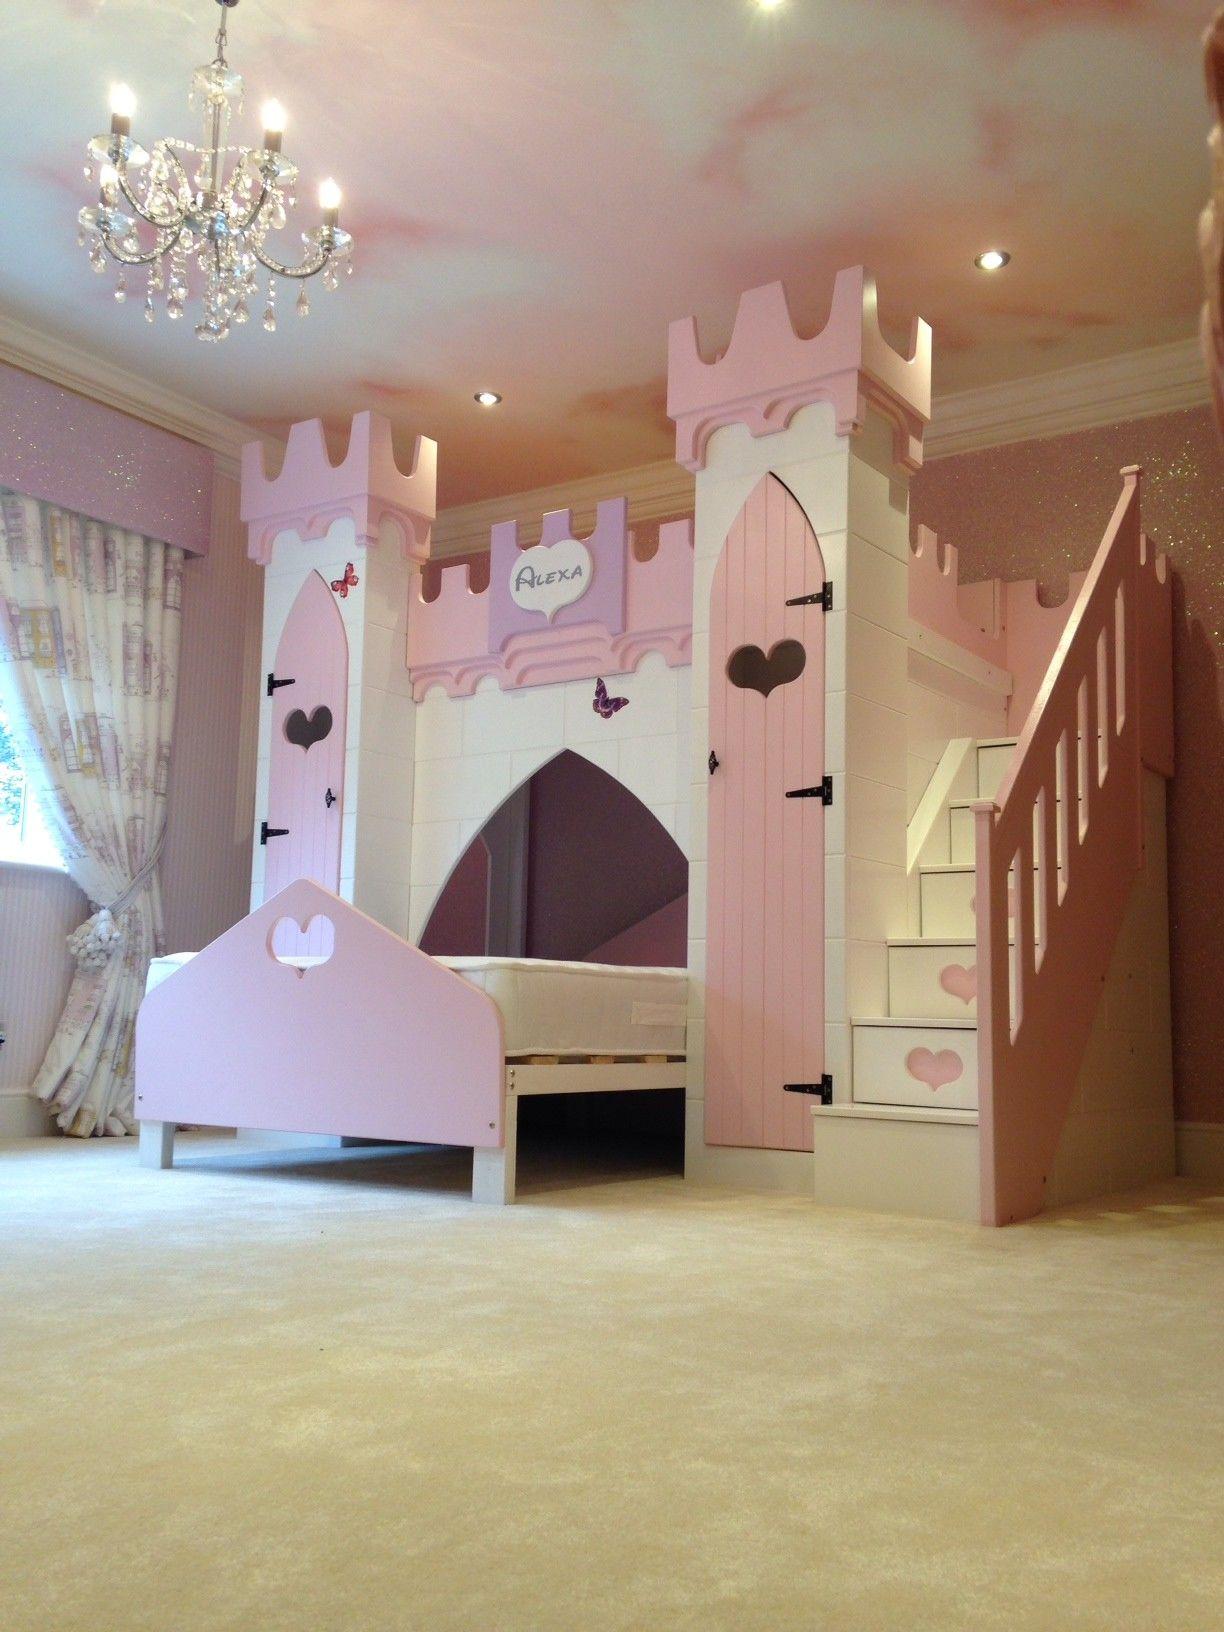 Alexa Princess Castle Bed Children Themed Beds Decoratorist 113029 Castle Bed Princess Bunk Beds Princess Castle Bed